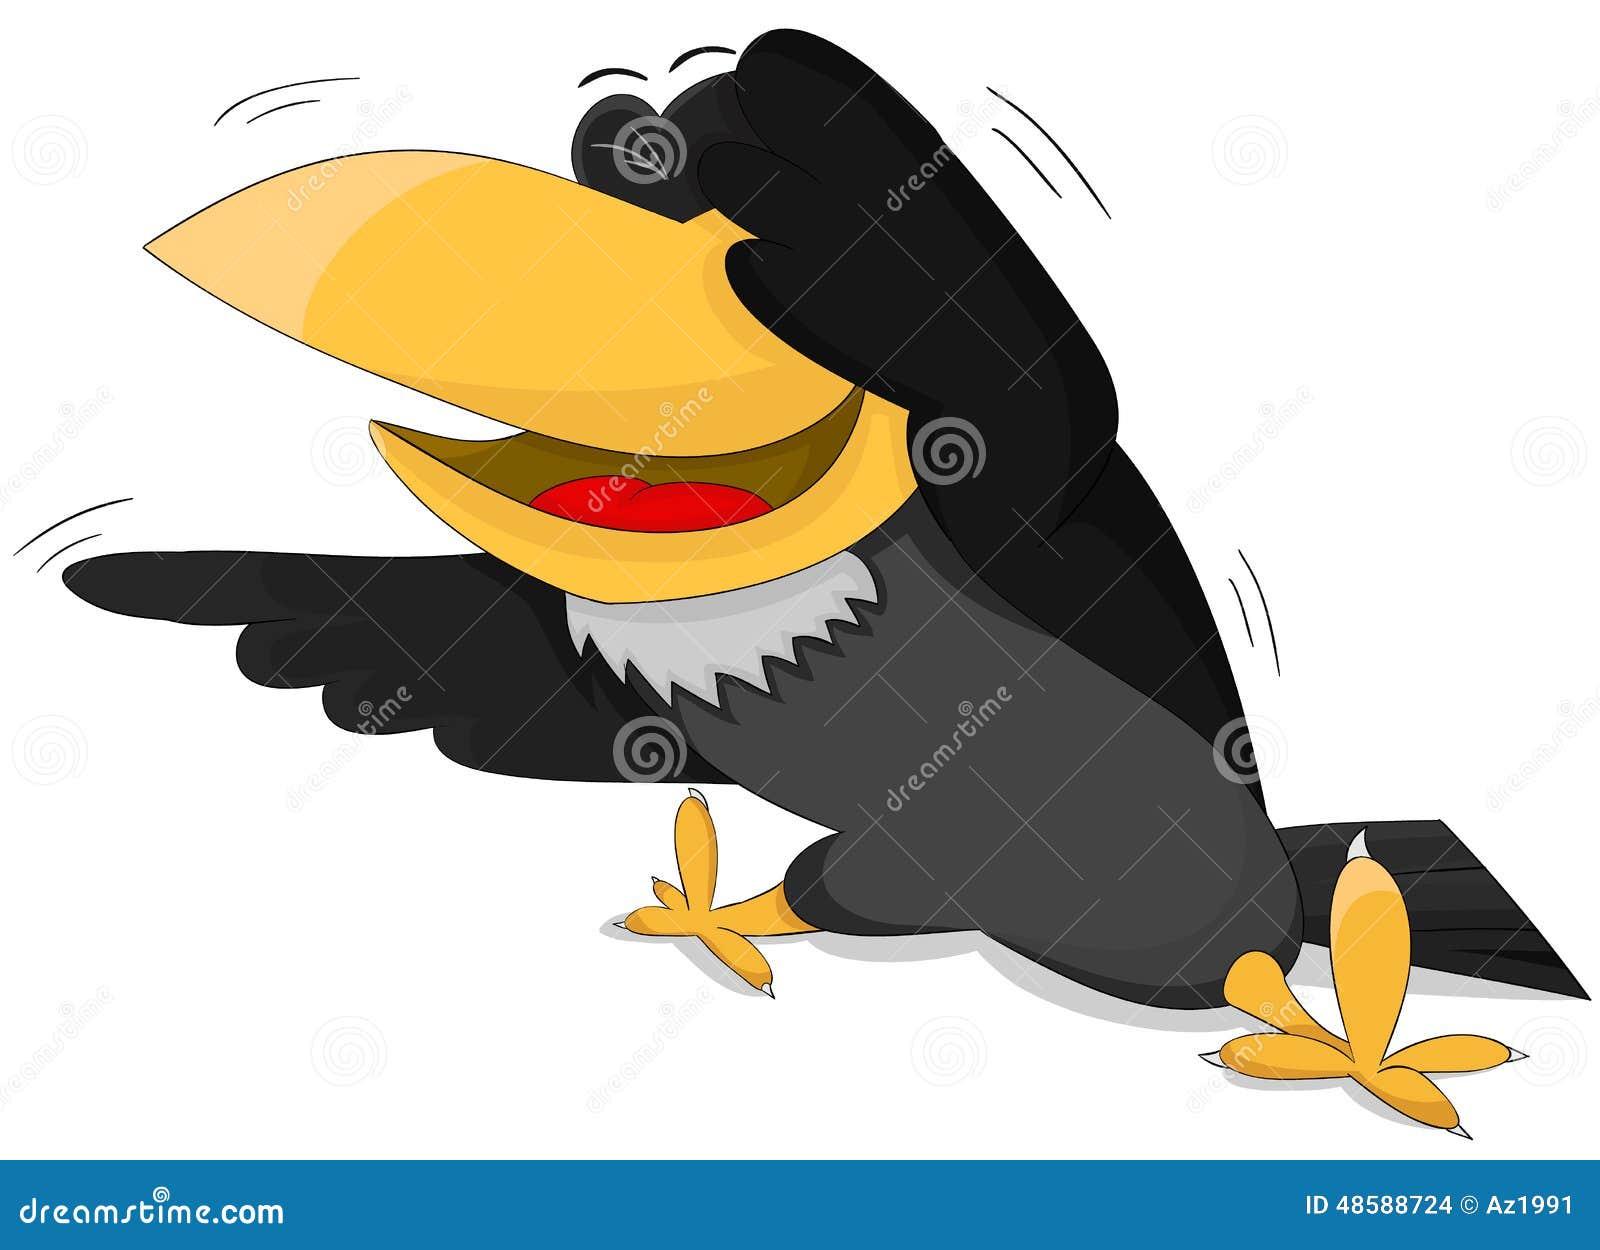 Cartoon Raven Stock Photos - Image: 35421173